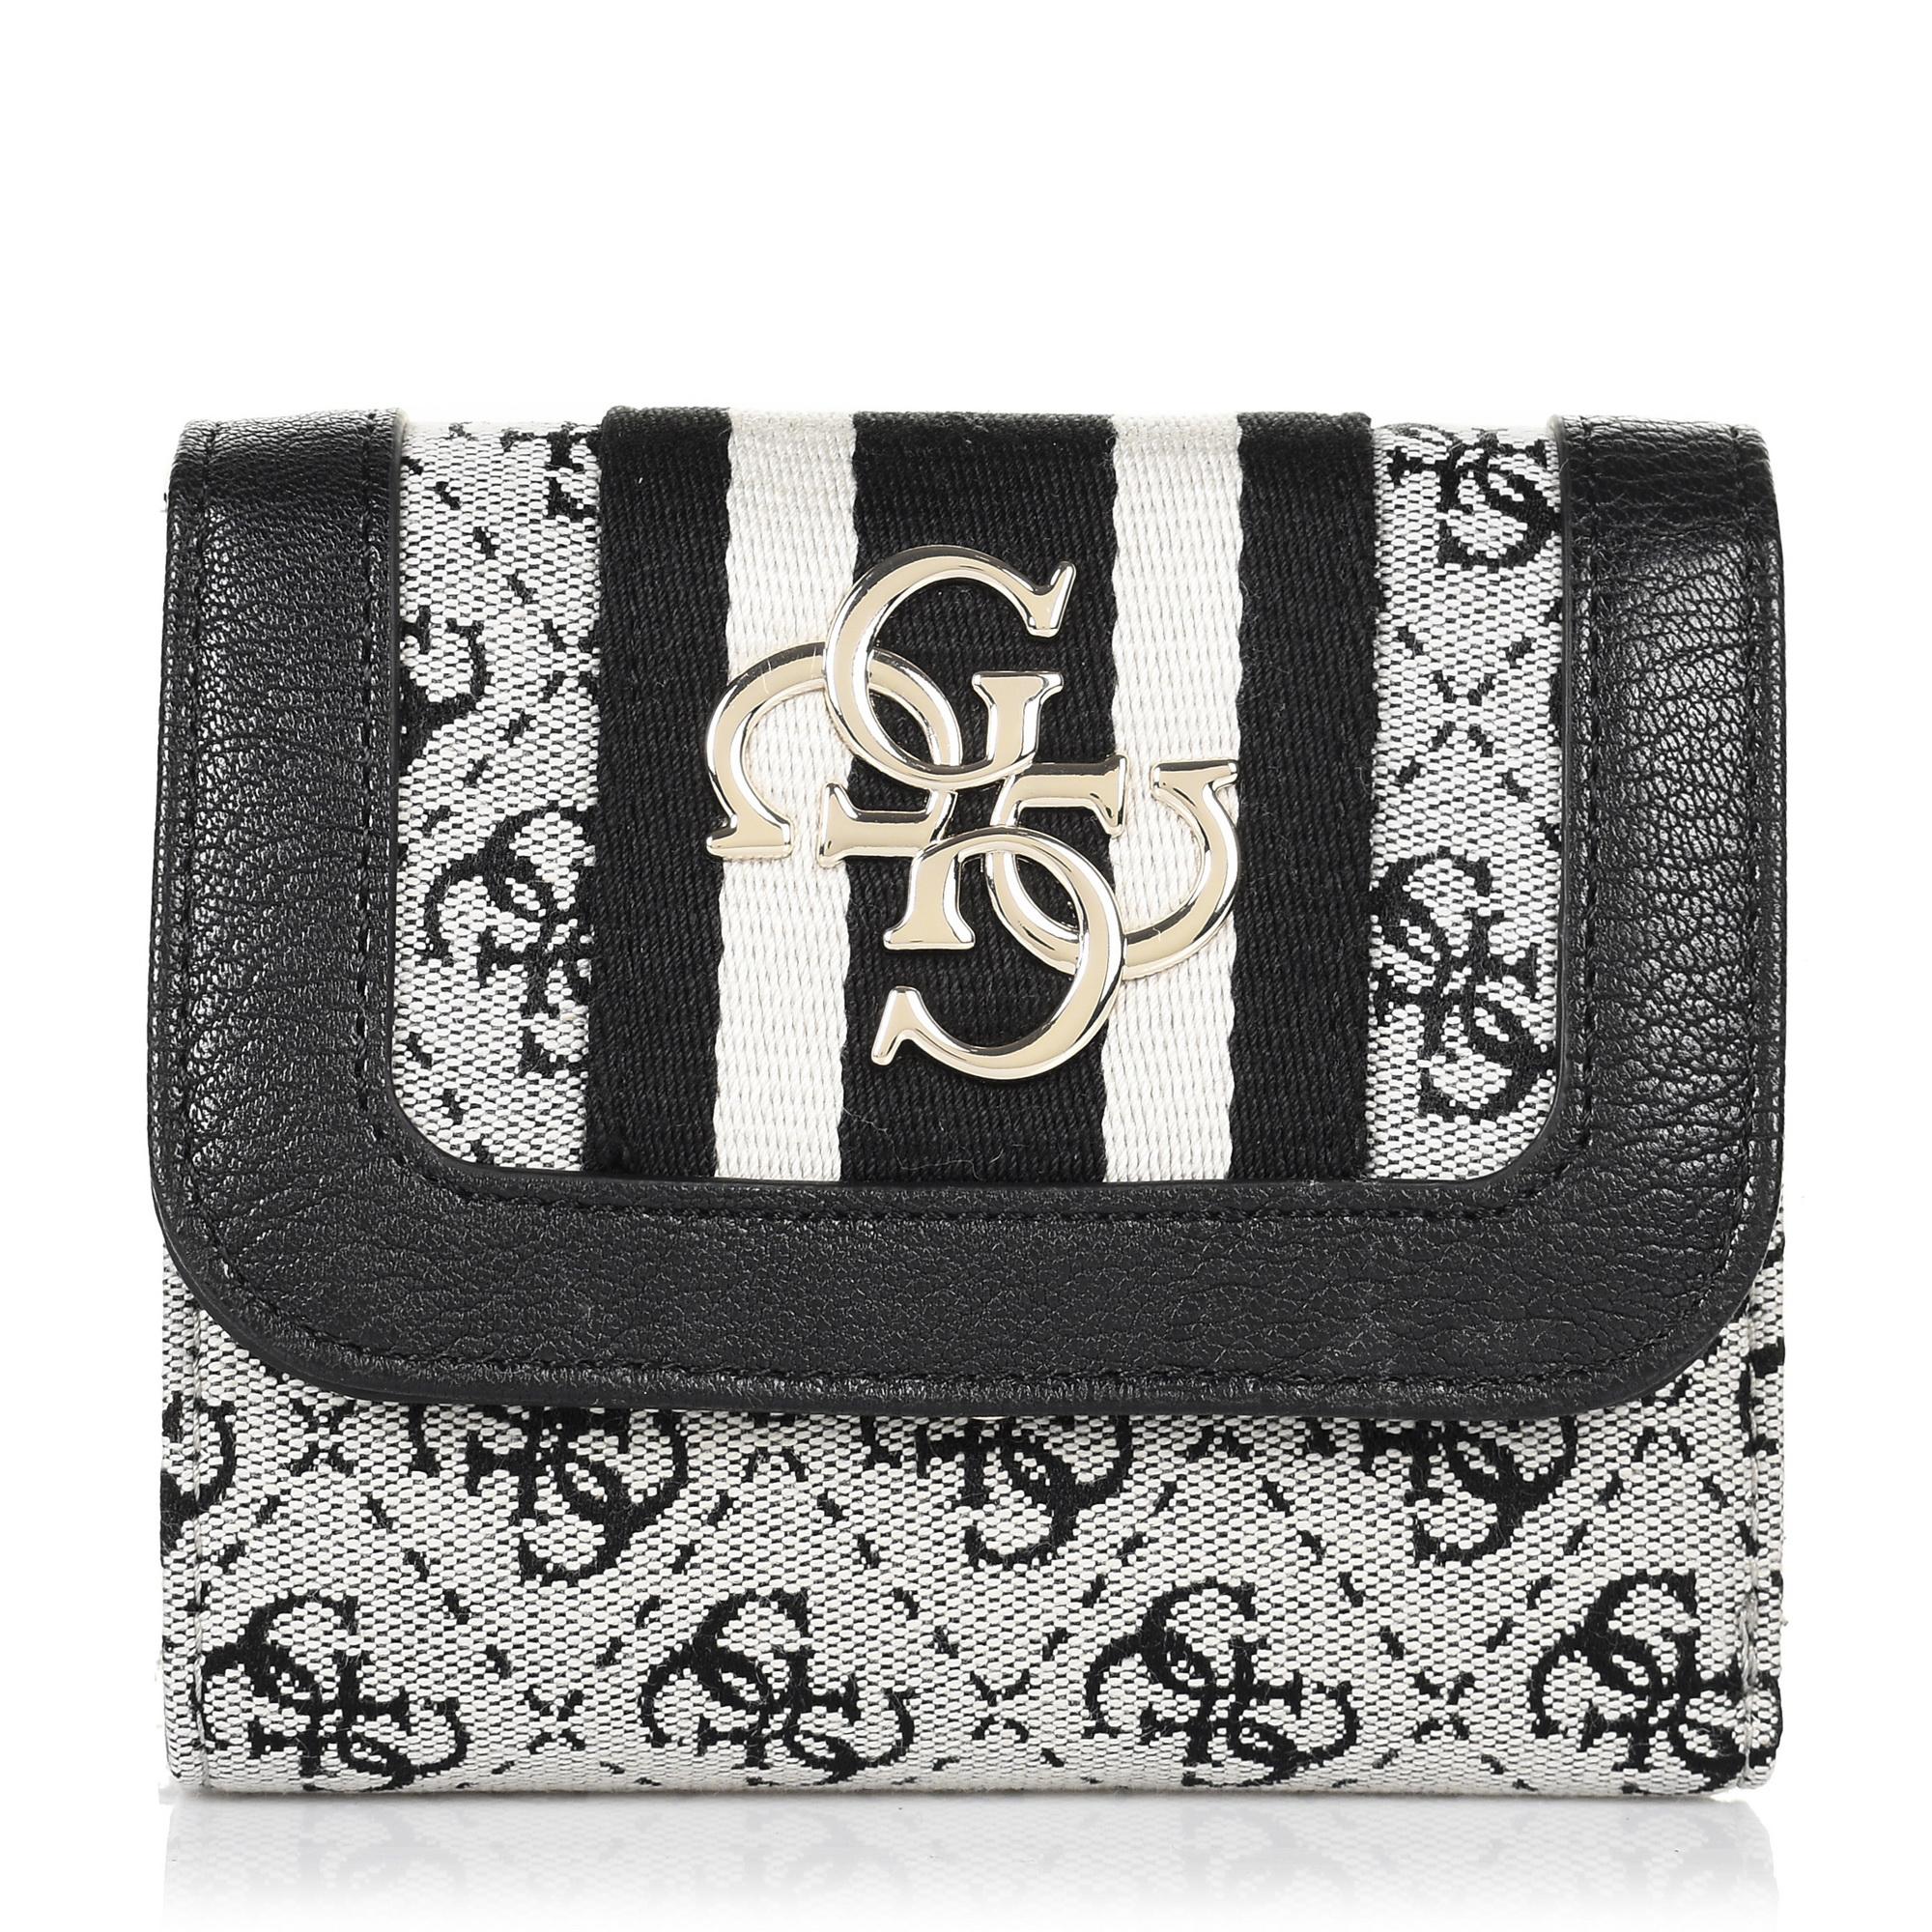 a0229db258 Brand Bags Πορτοφόλι Guess Vintage SLG SG730443